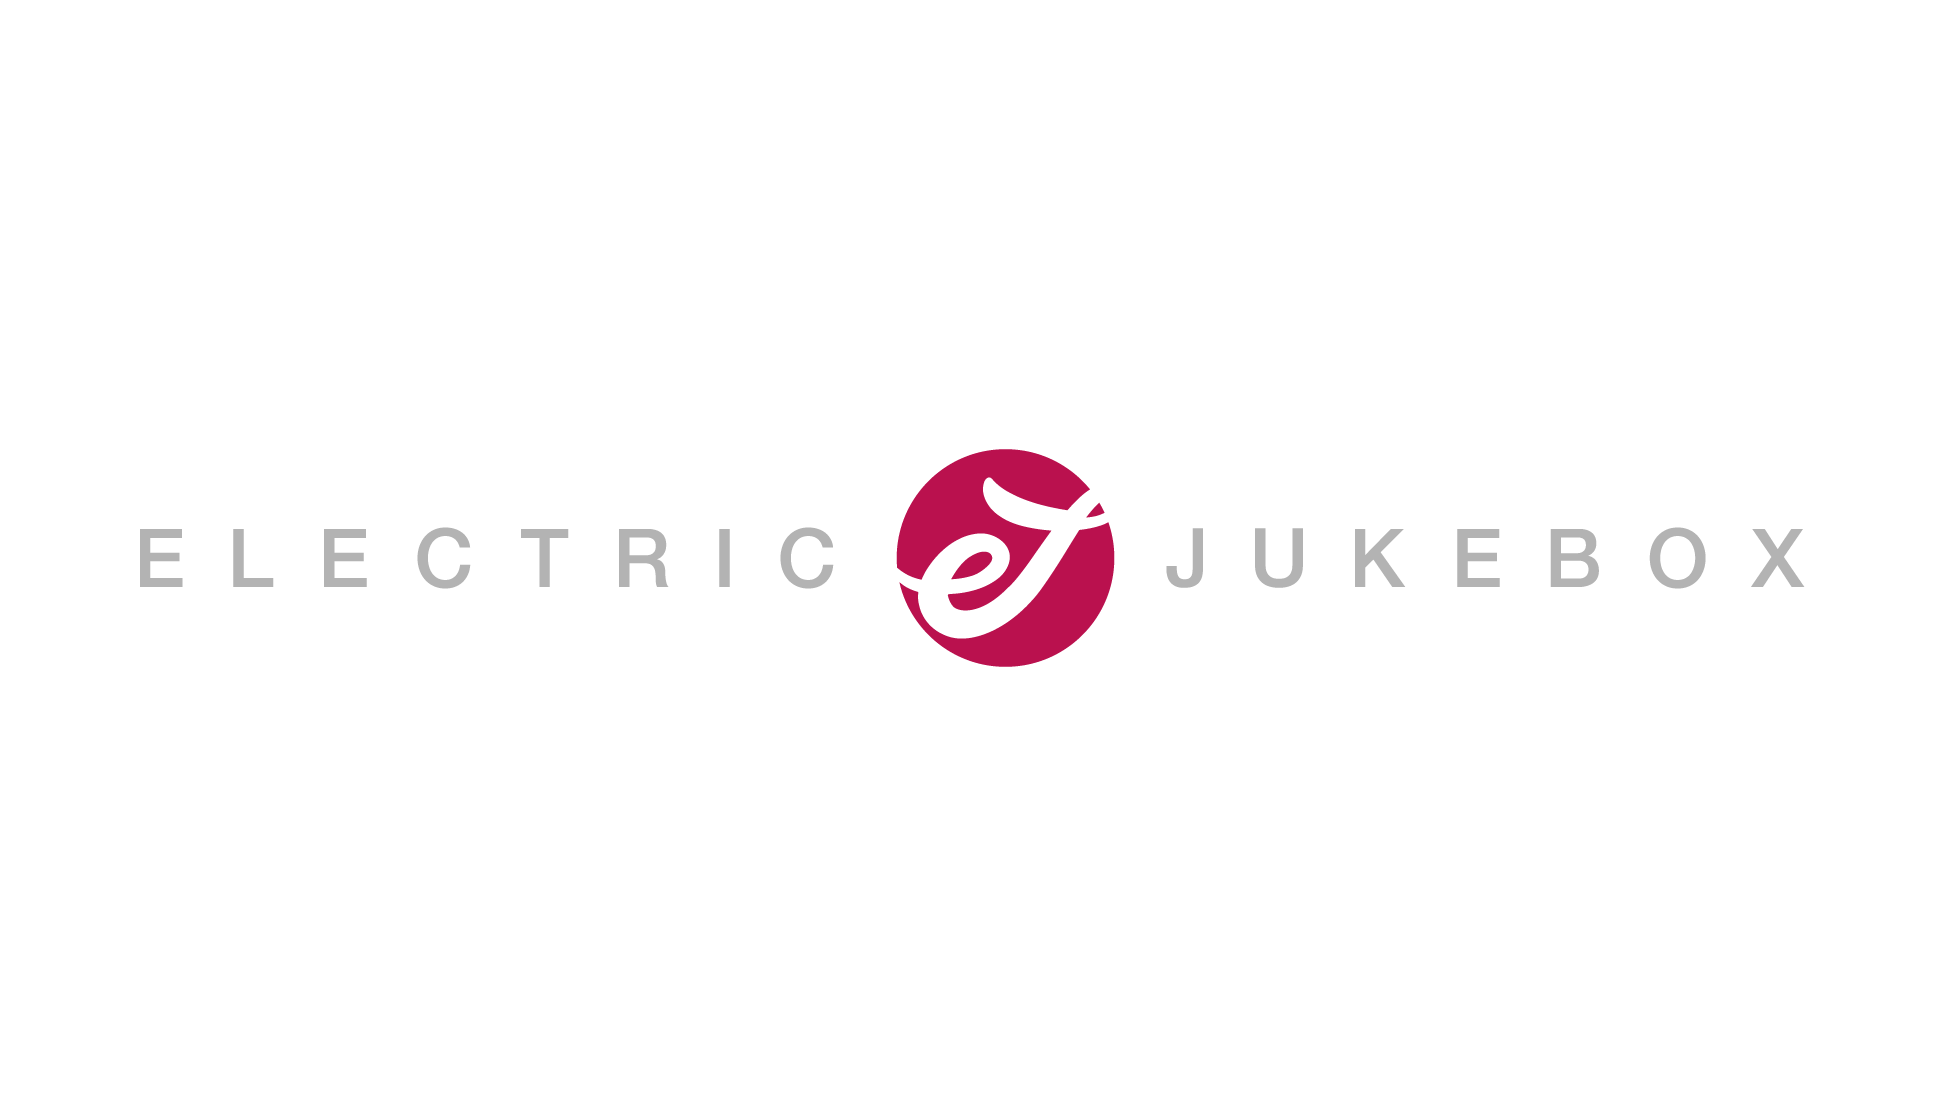 Electric Jukebox company logo